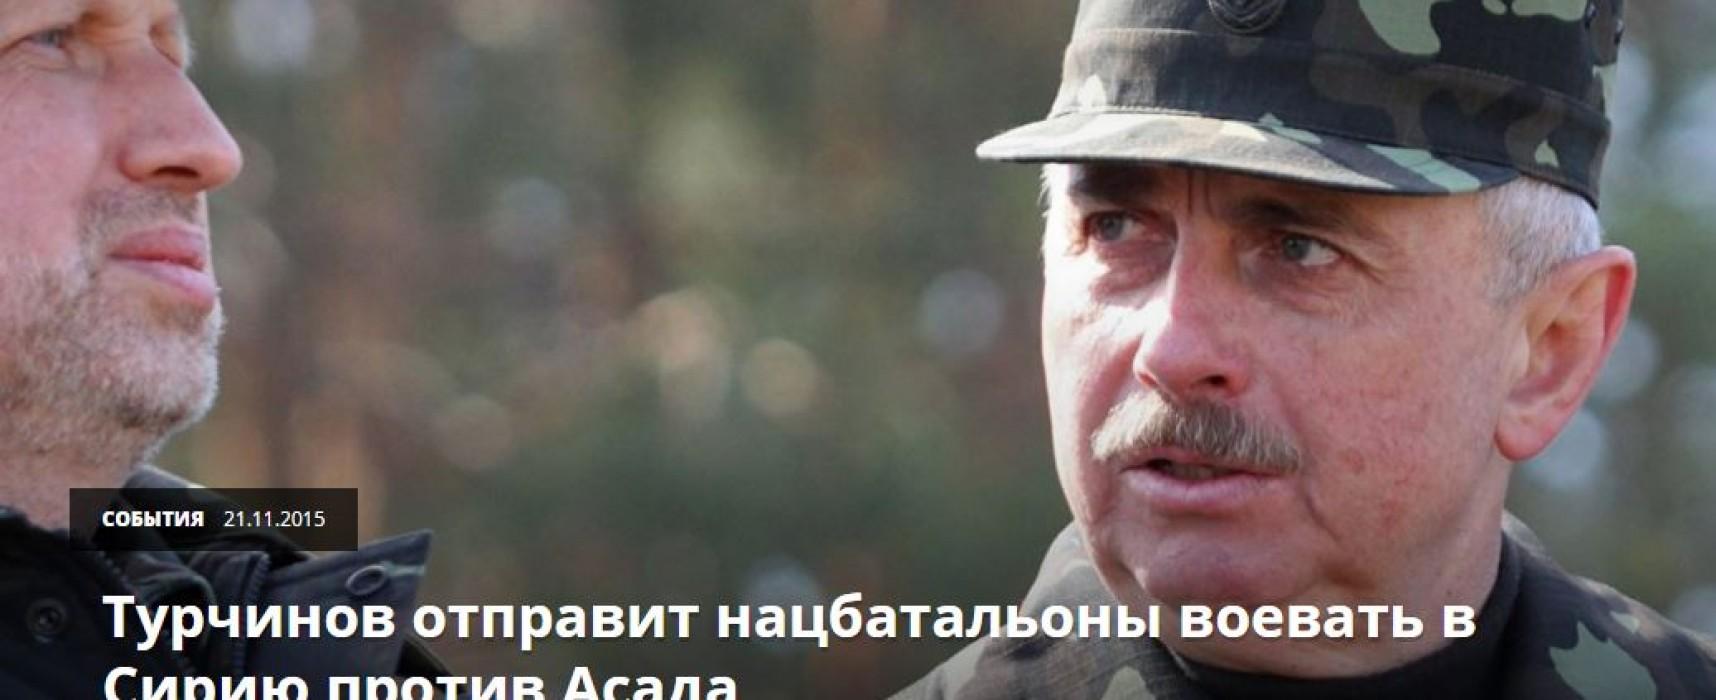 Fake: Oekraïense militairen in Syrië